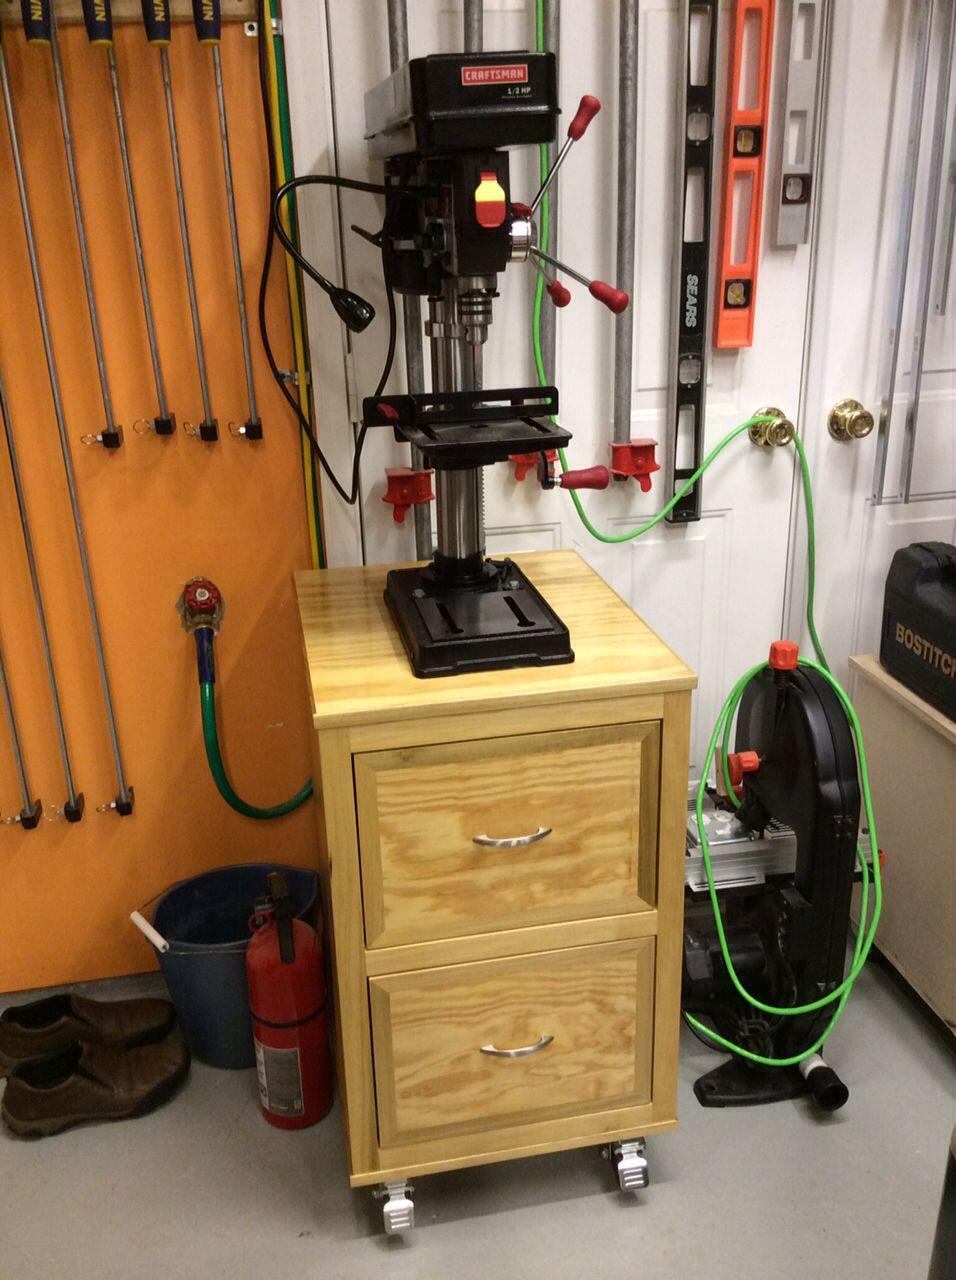 Drill press drill press stand drill press home diy